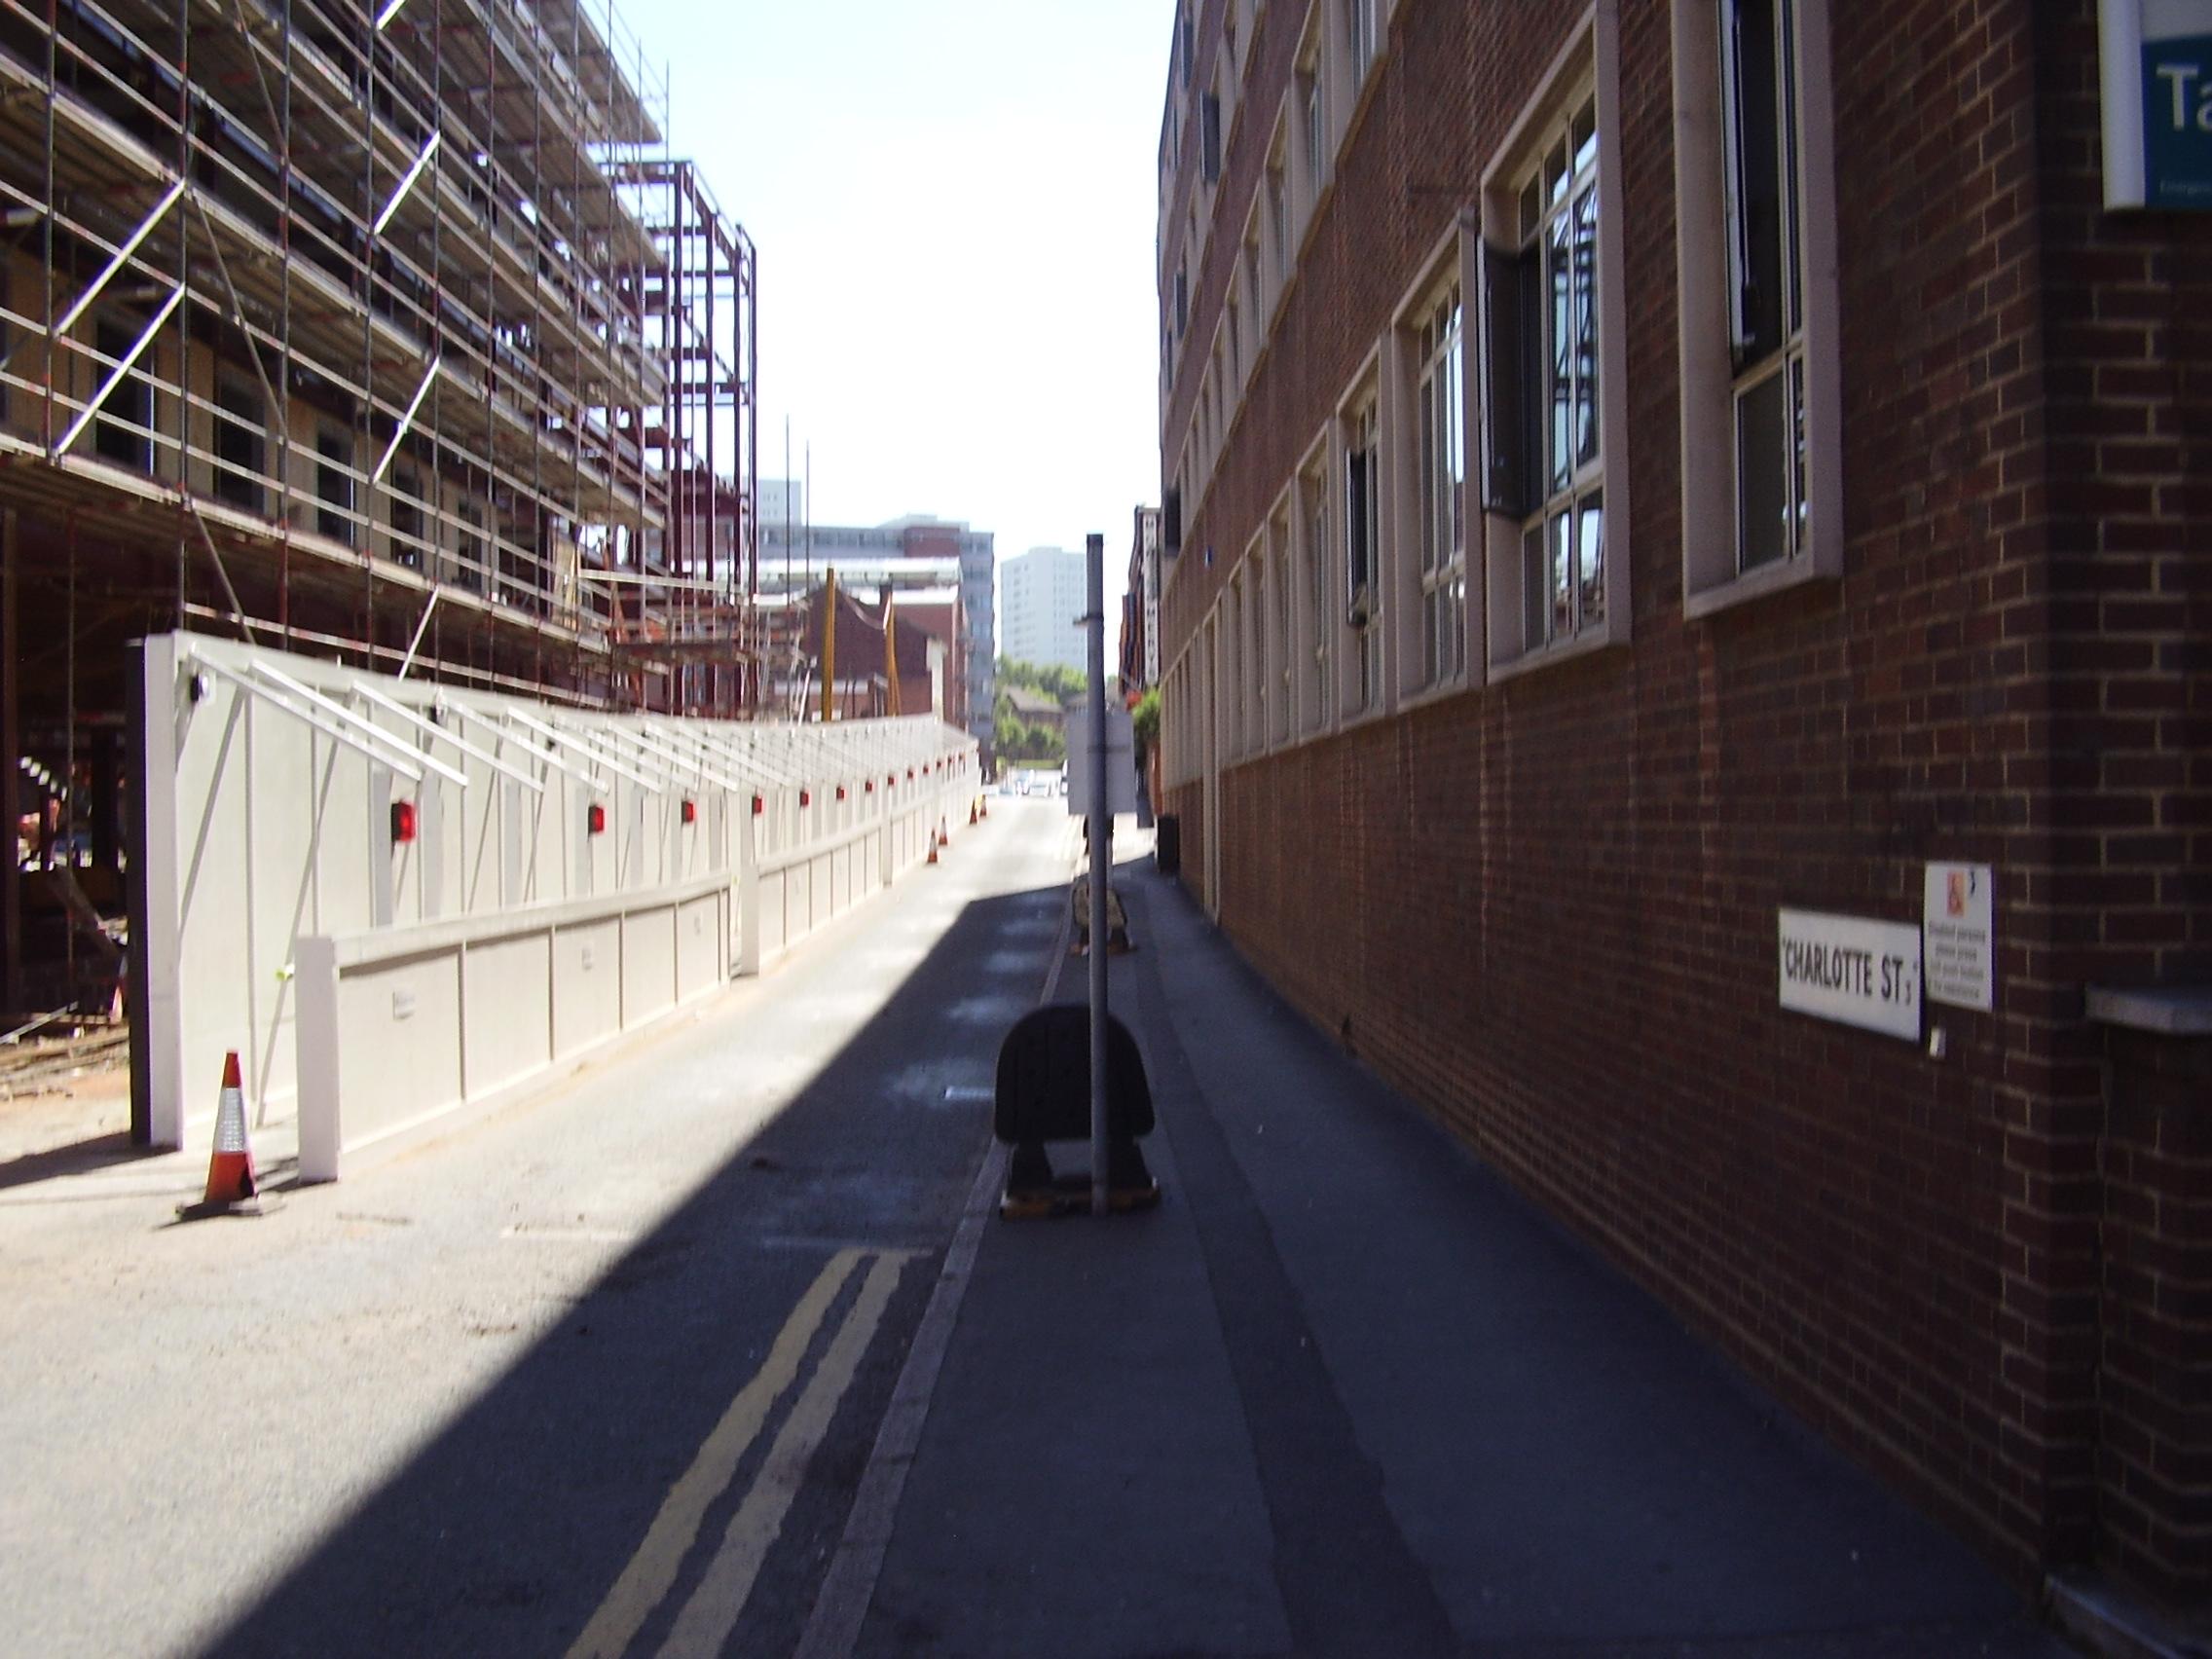 2008 Street view photo 27 of the Jewellery Quarter Birmingham